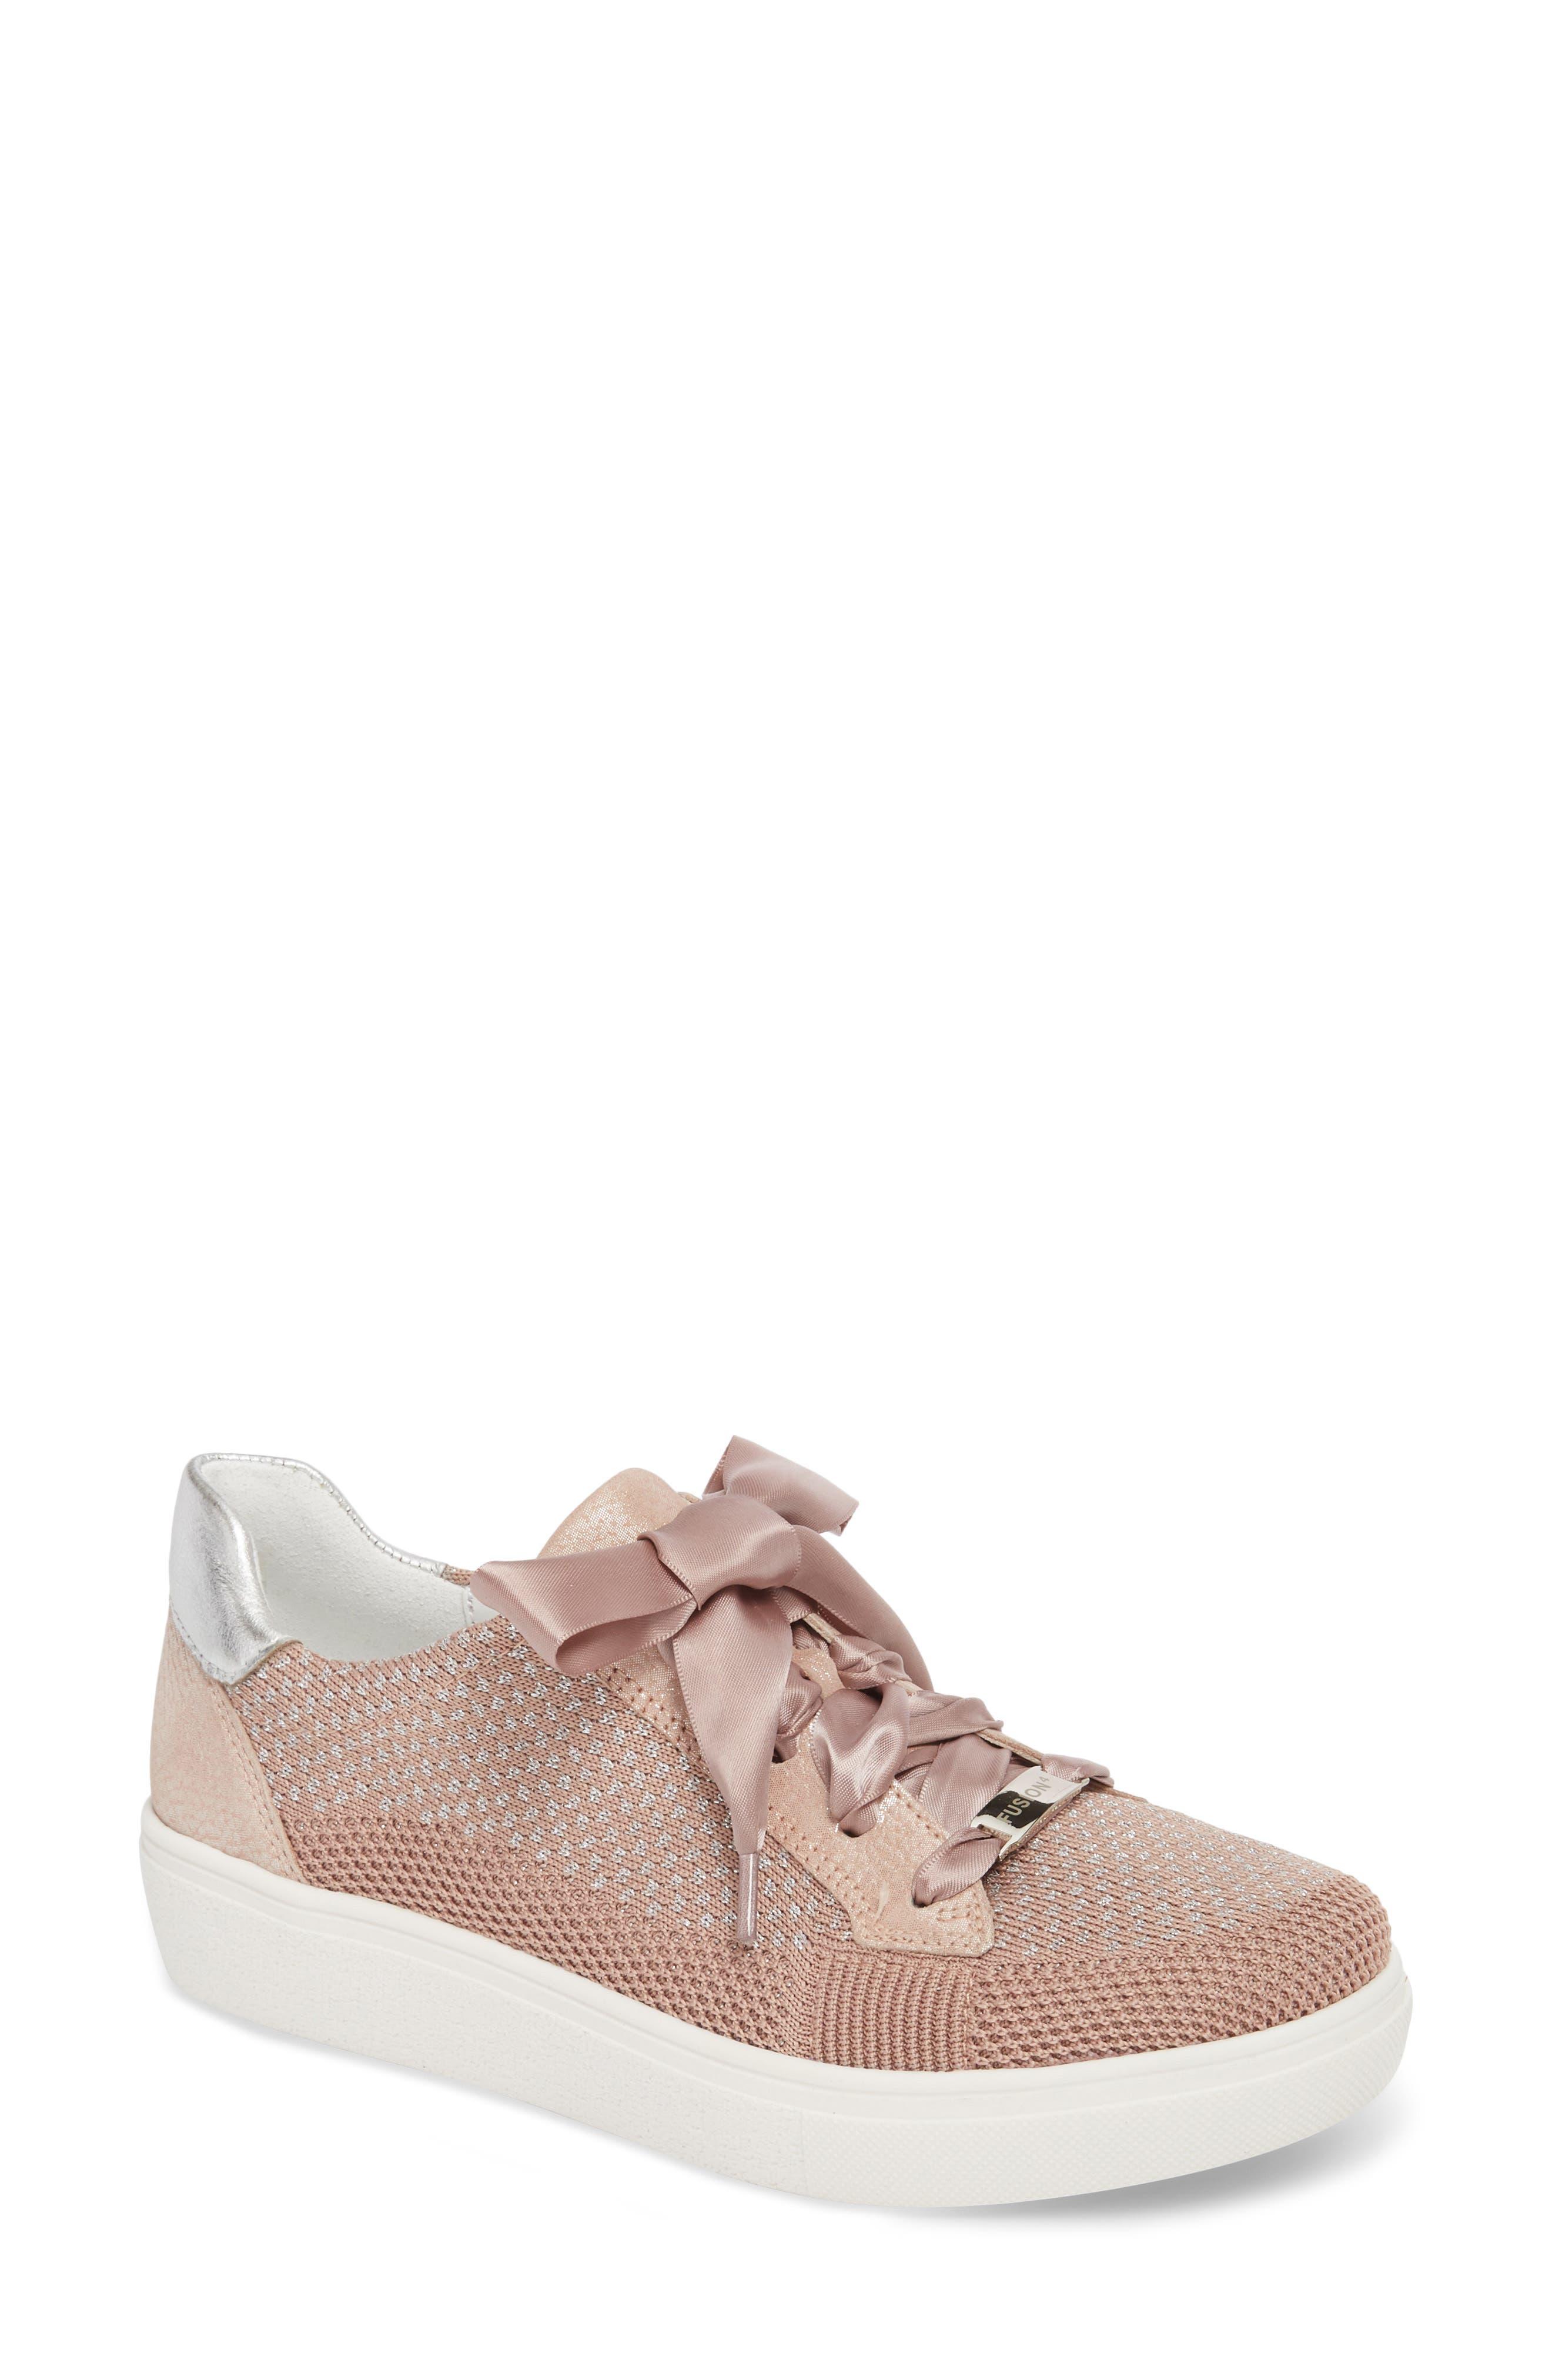 Natalya Sneaker,                         Main,                         color, POWDER FABRIC